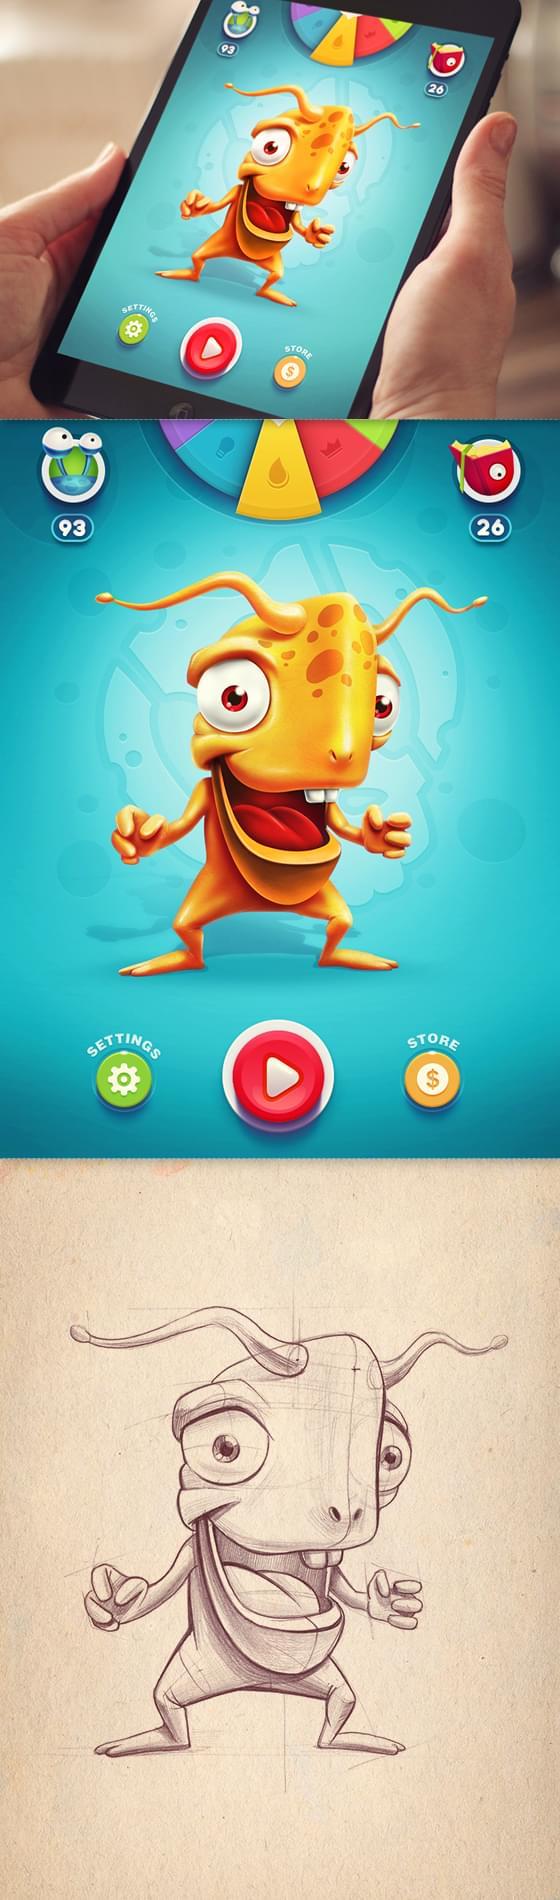 Vaganzaa: iOS Game